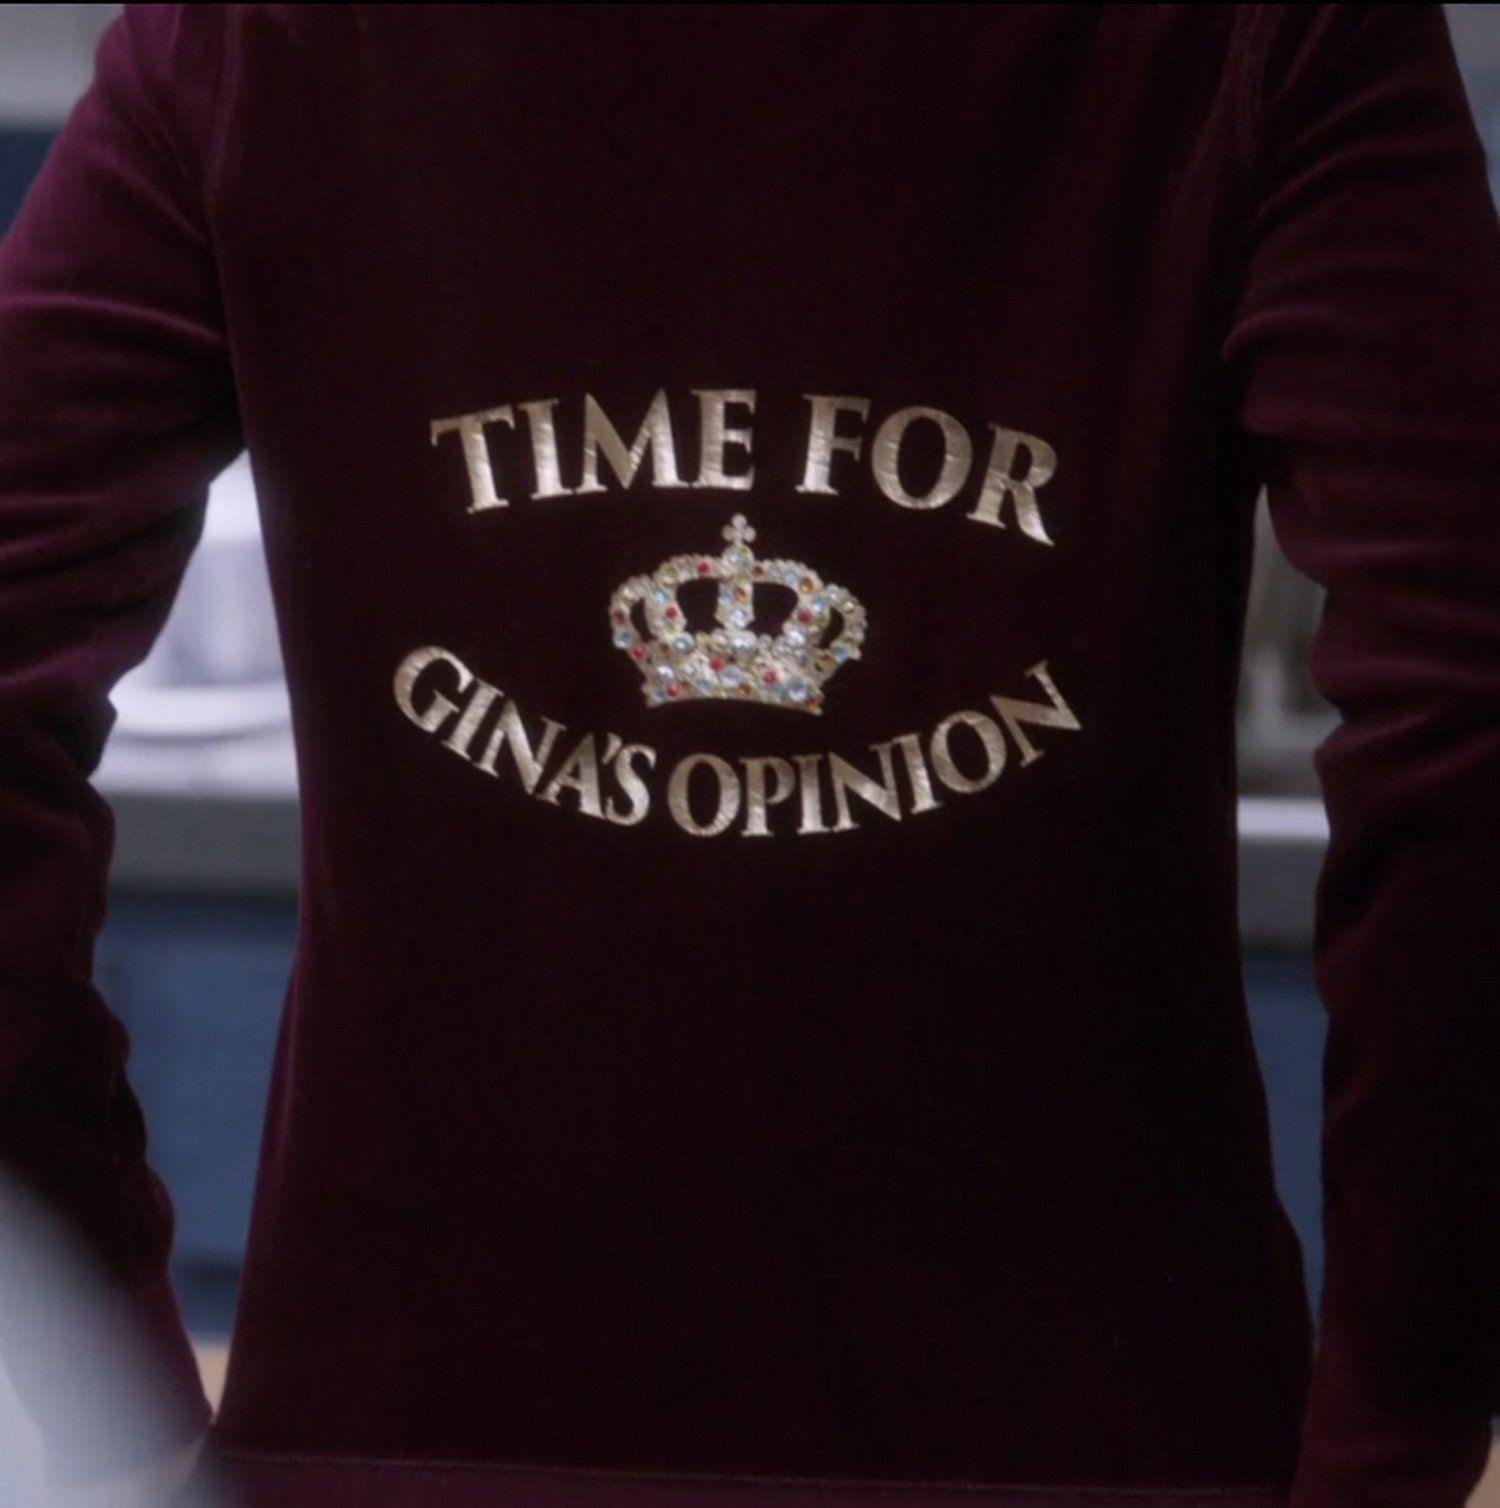 29777e701 Brooklyn 99 Sweater - Brooklyn Nine Nine Hoodie - Time for Gina's Opinion Hooded  Sweatshirt - Gina Linetti Quote Shirt - B99 Shirt - NYPD